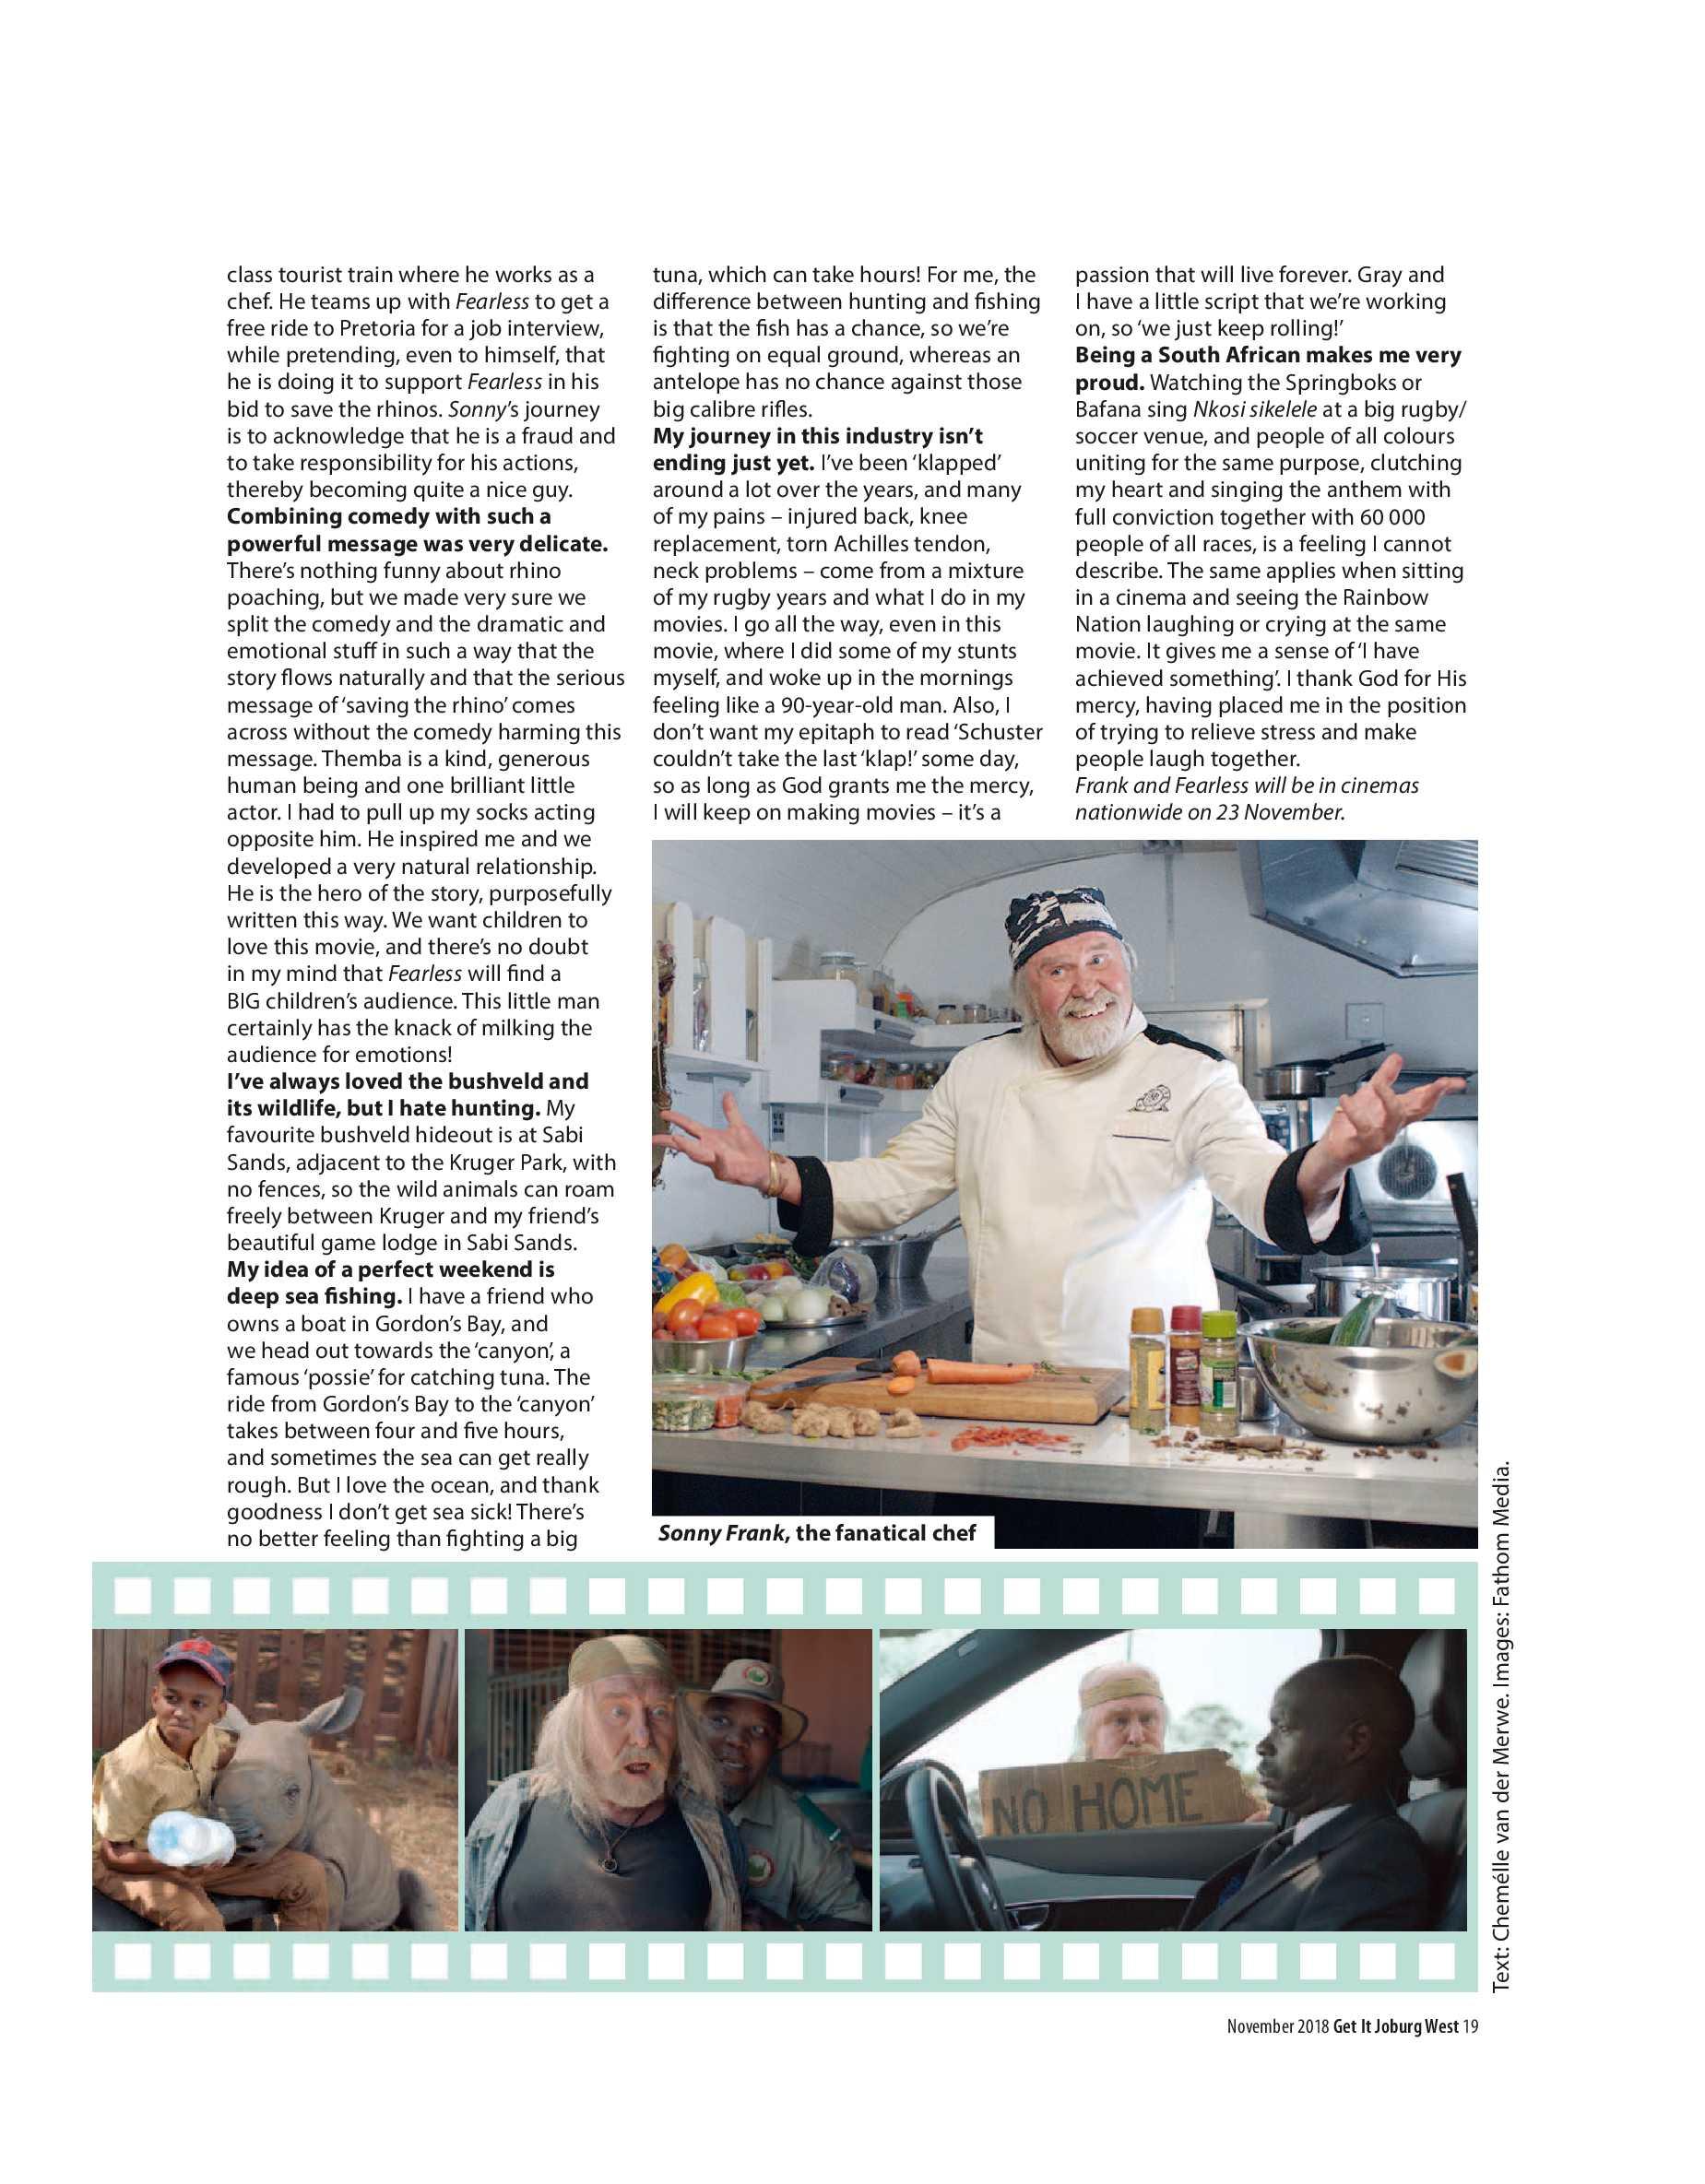 get-joburg-west-november-2018-epapers-page-19